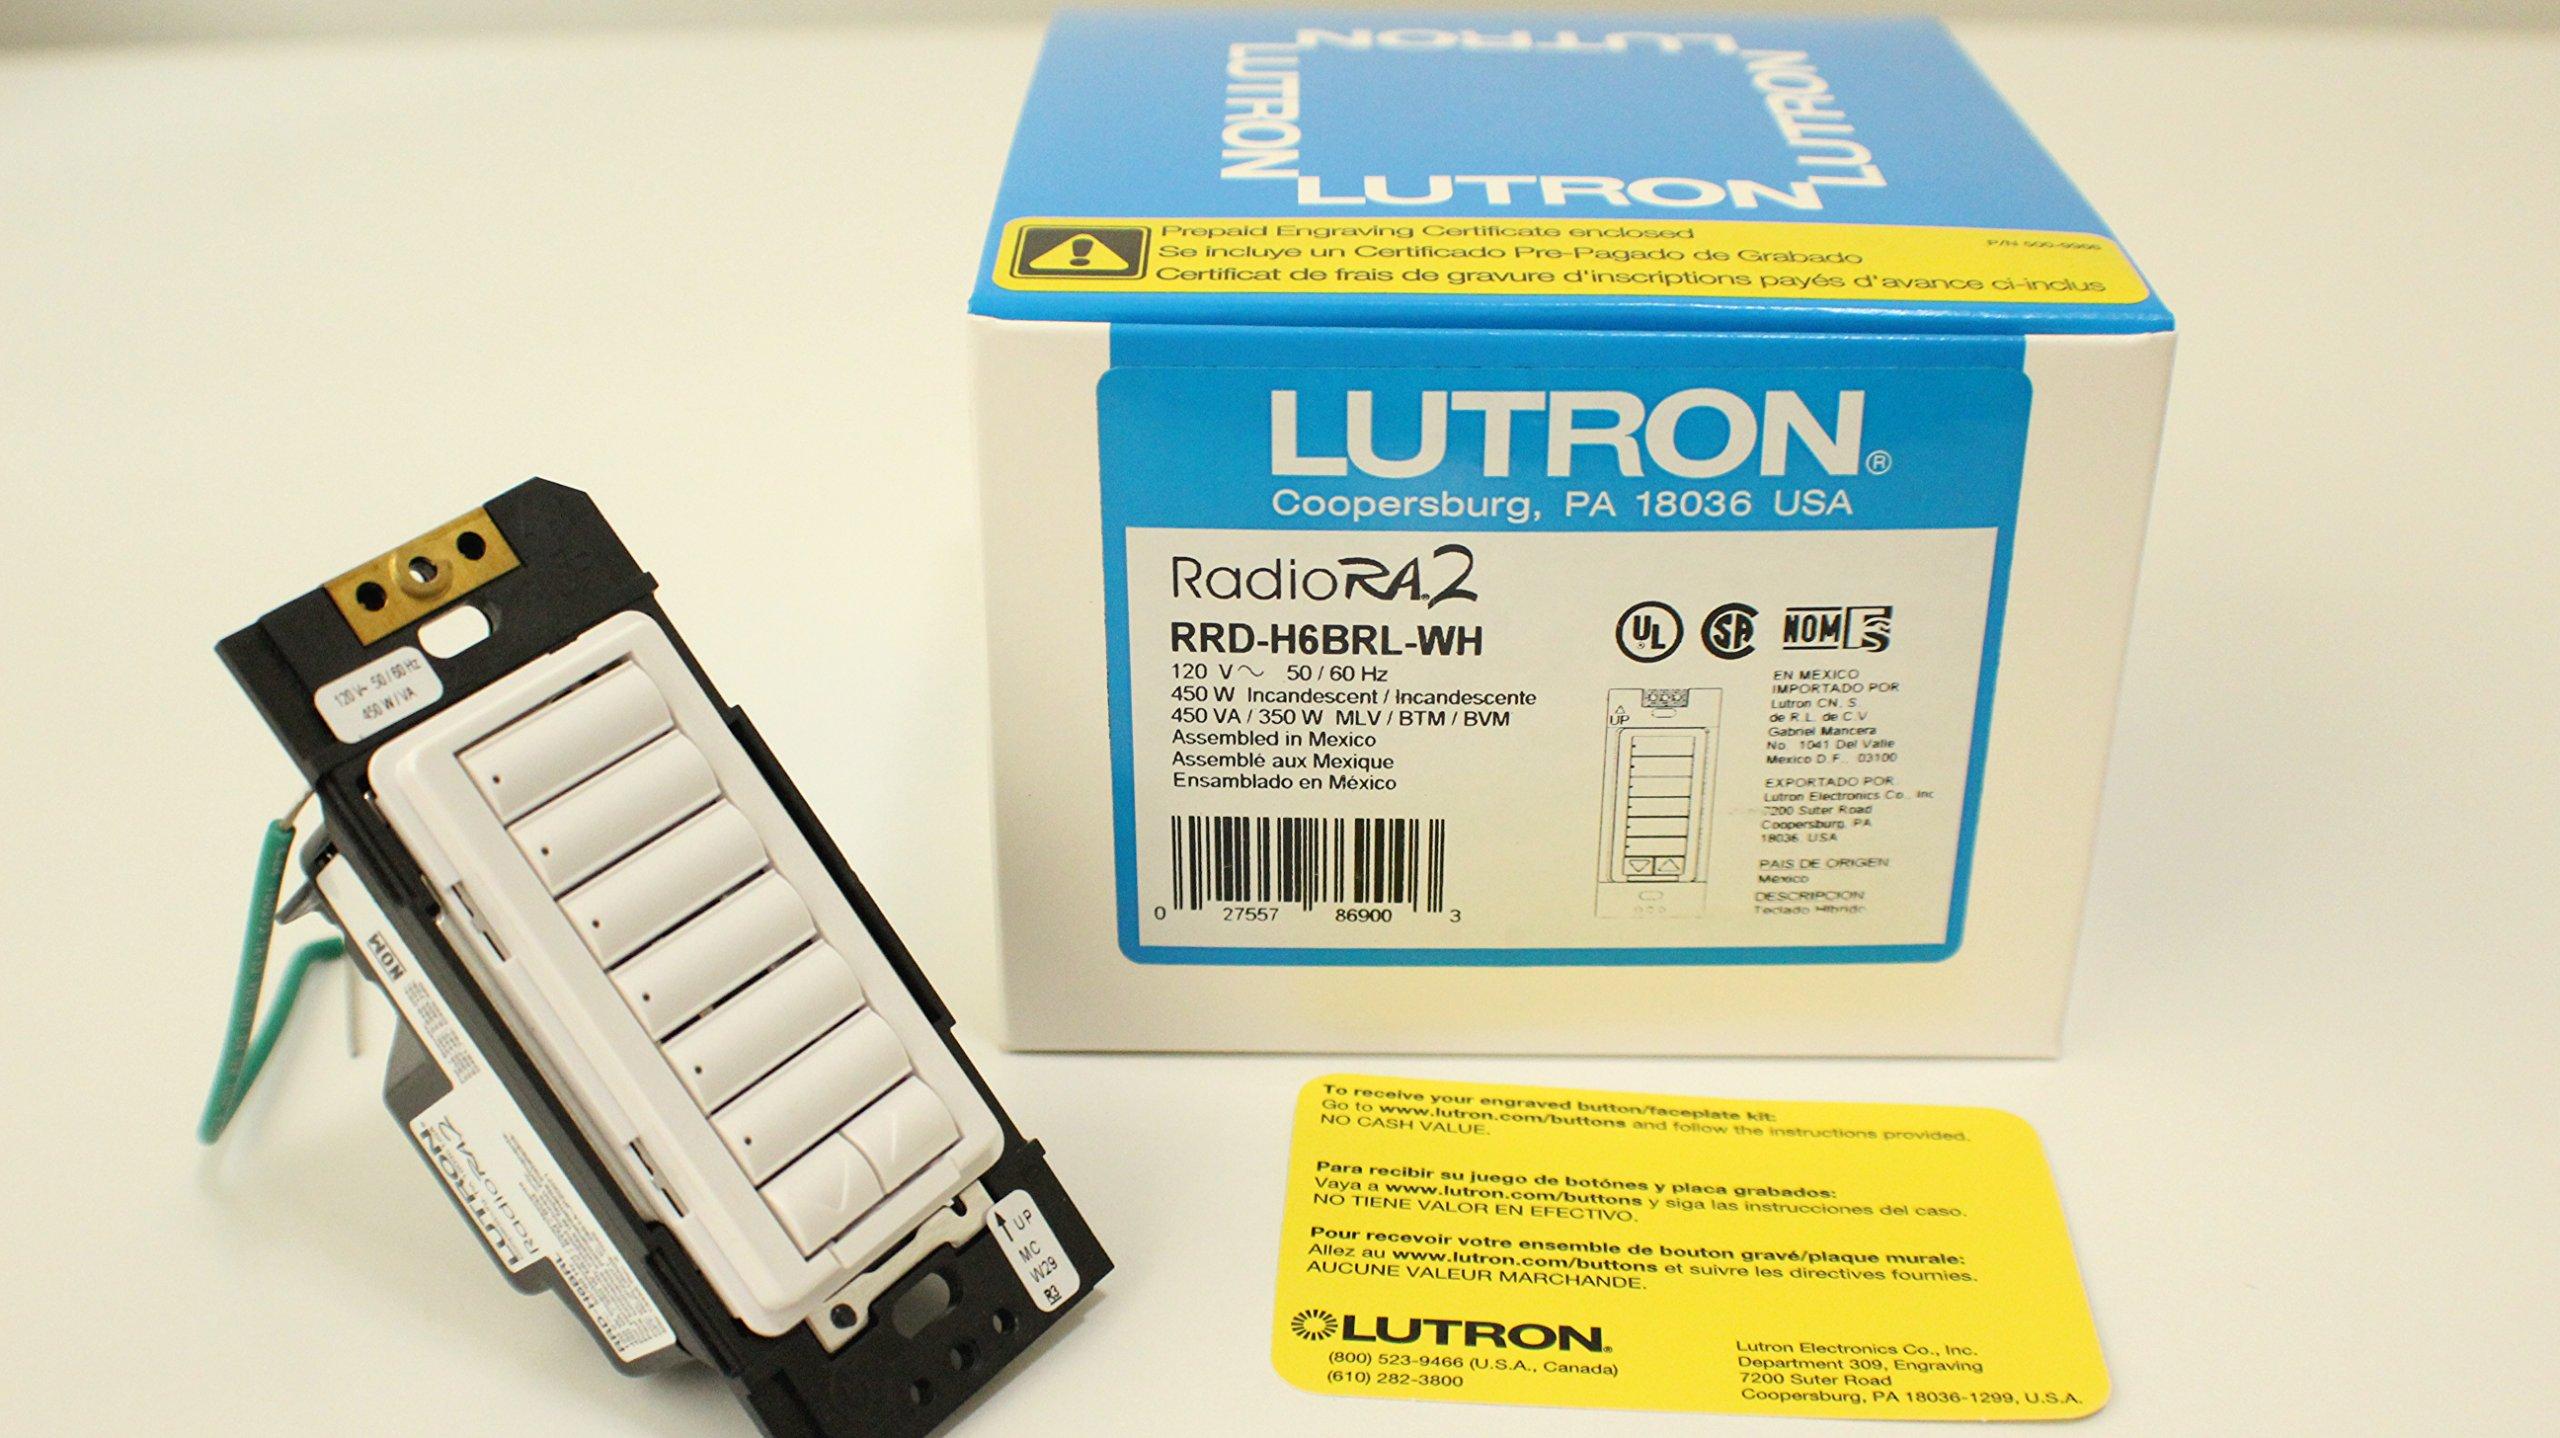 Buy Lutron 86900 Rrd H6brl Wh Radiora 2 Hybrid Wall Keypad 6 3 Way Switch Buttons